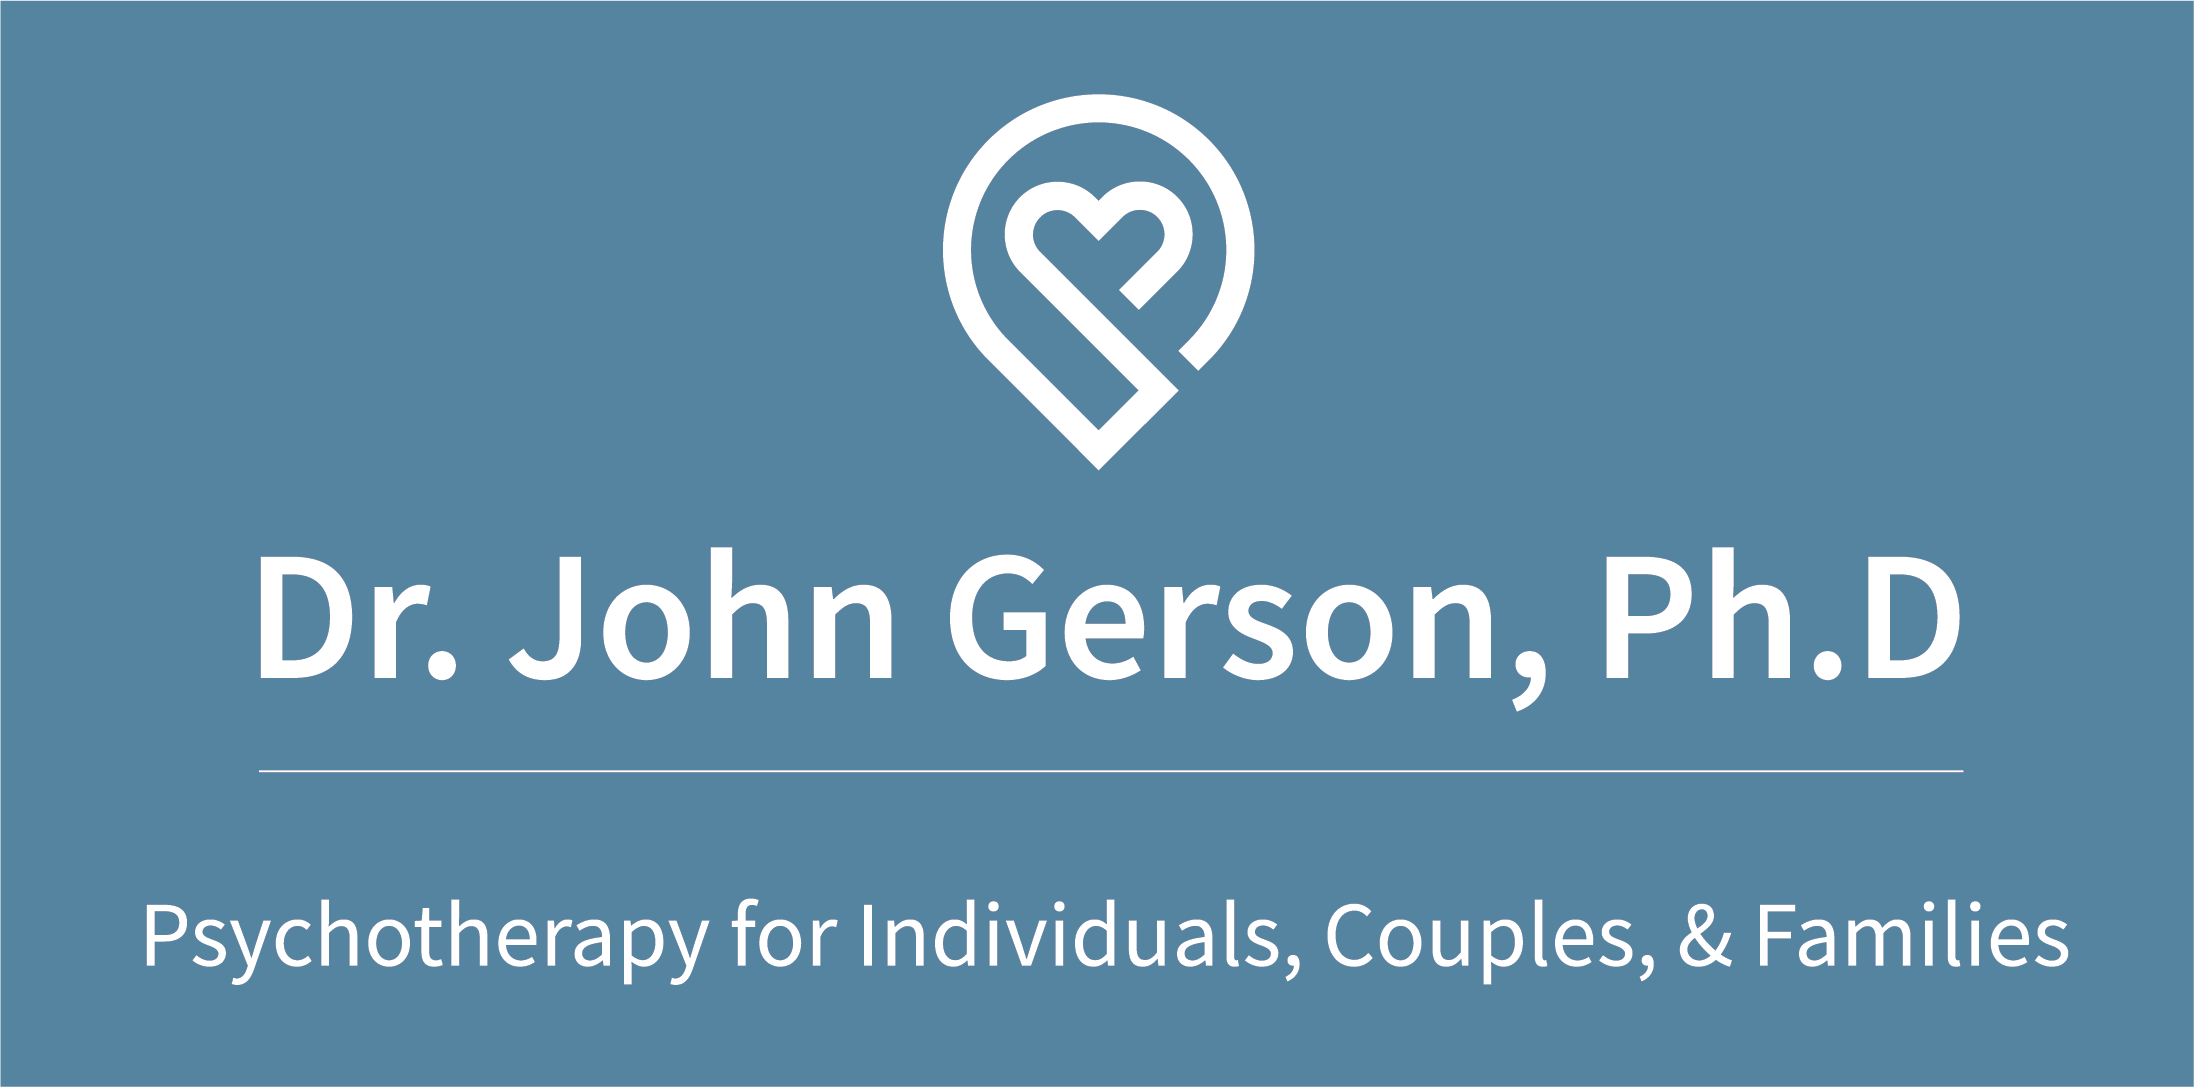 Dr. John Gerson, New York State Licensed Psychologist